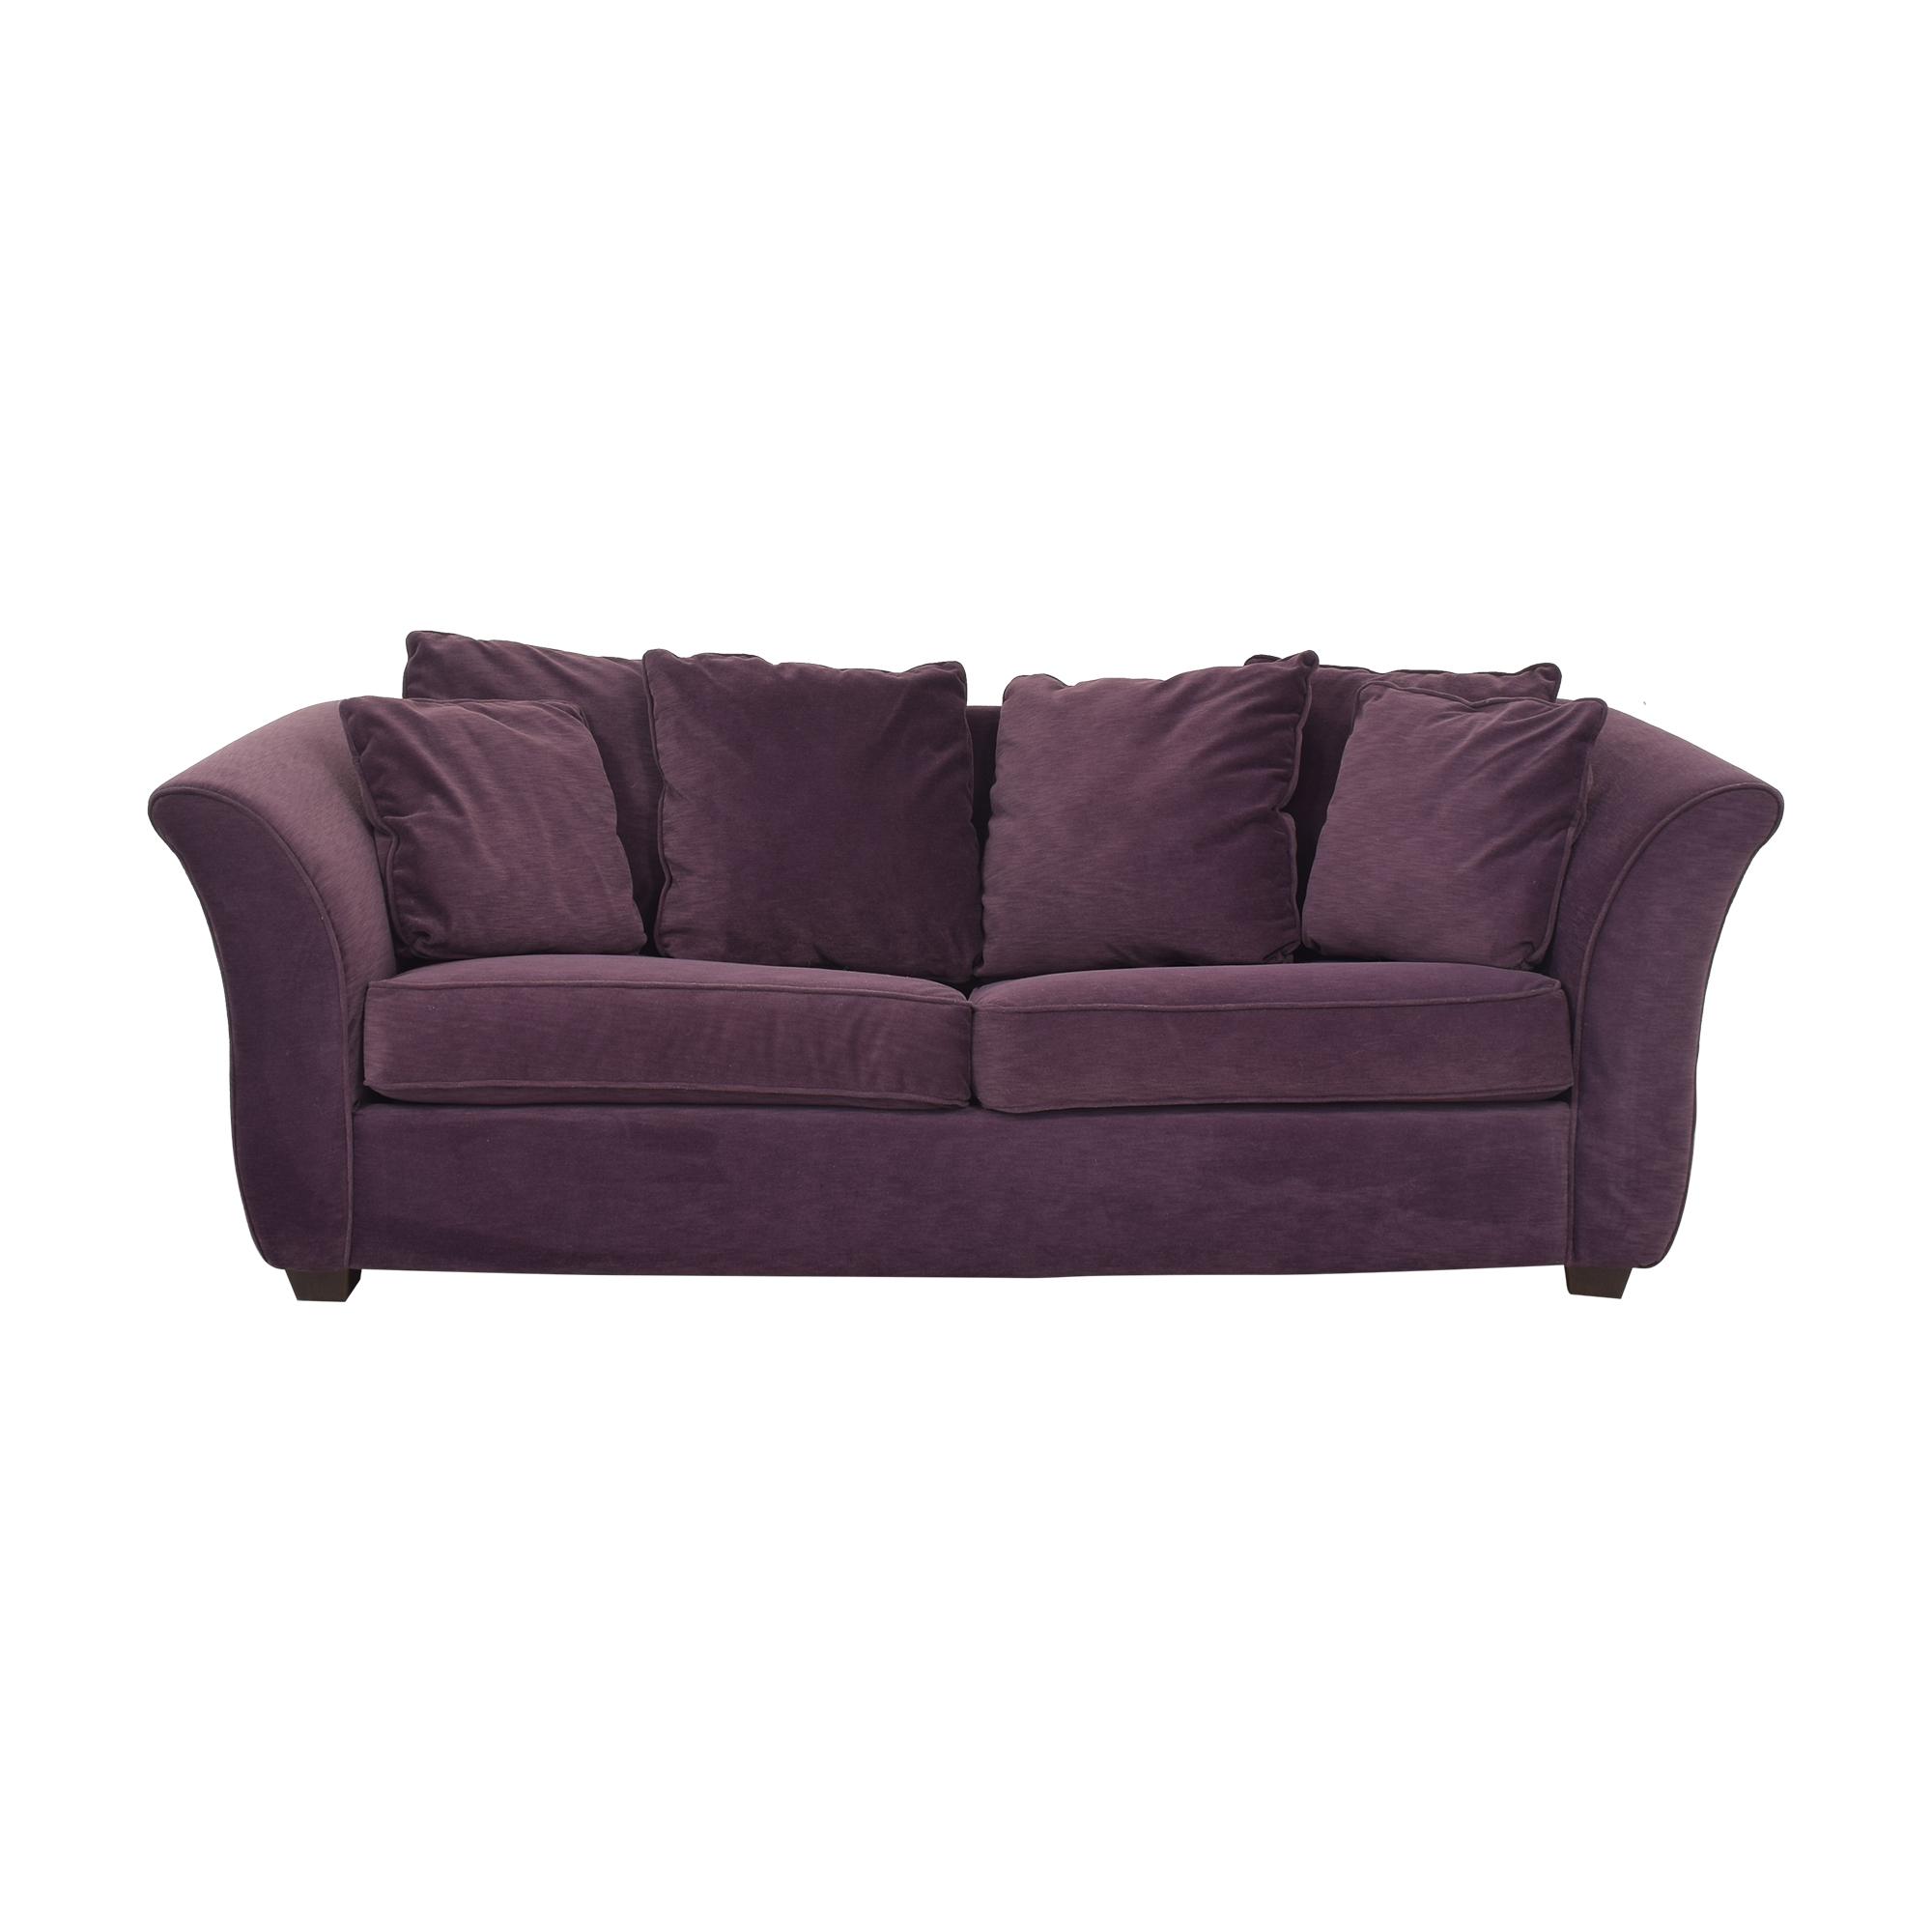 Furniture Taylor Made Sleeper Sofa